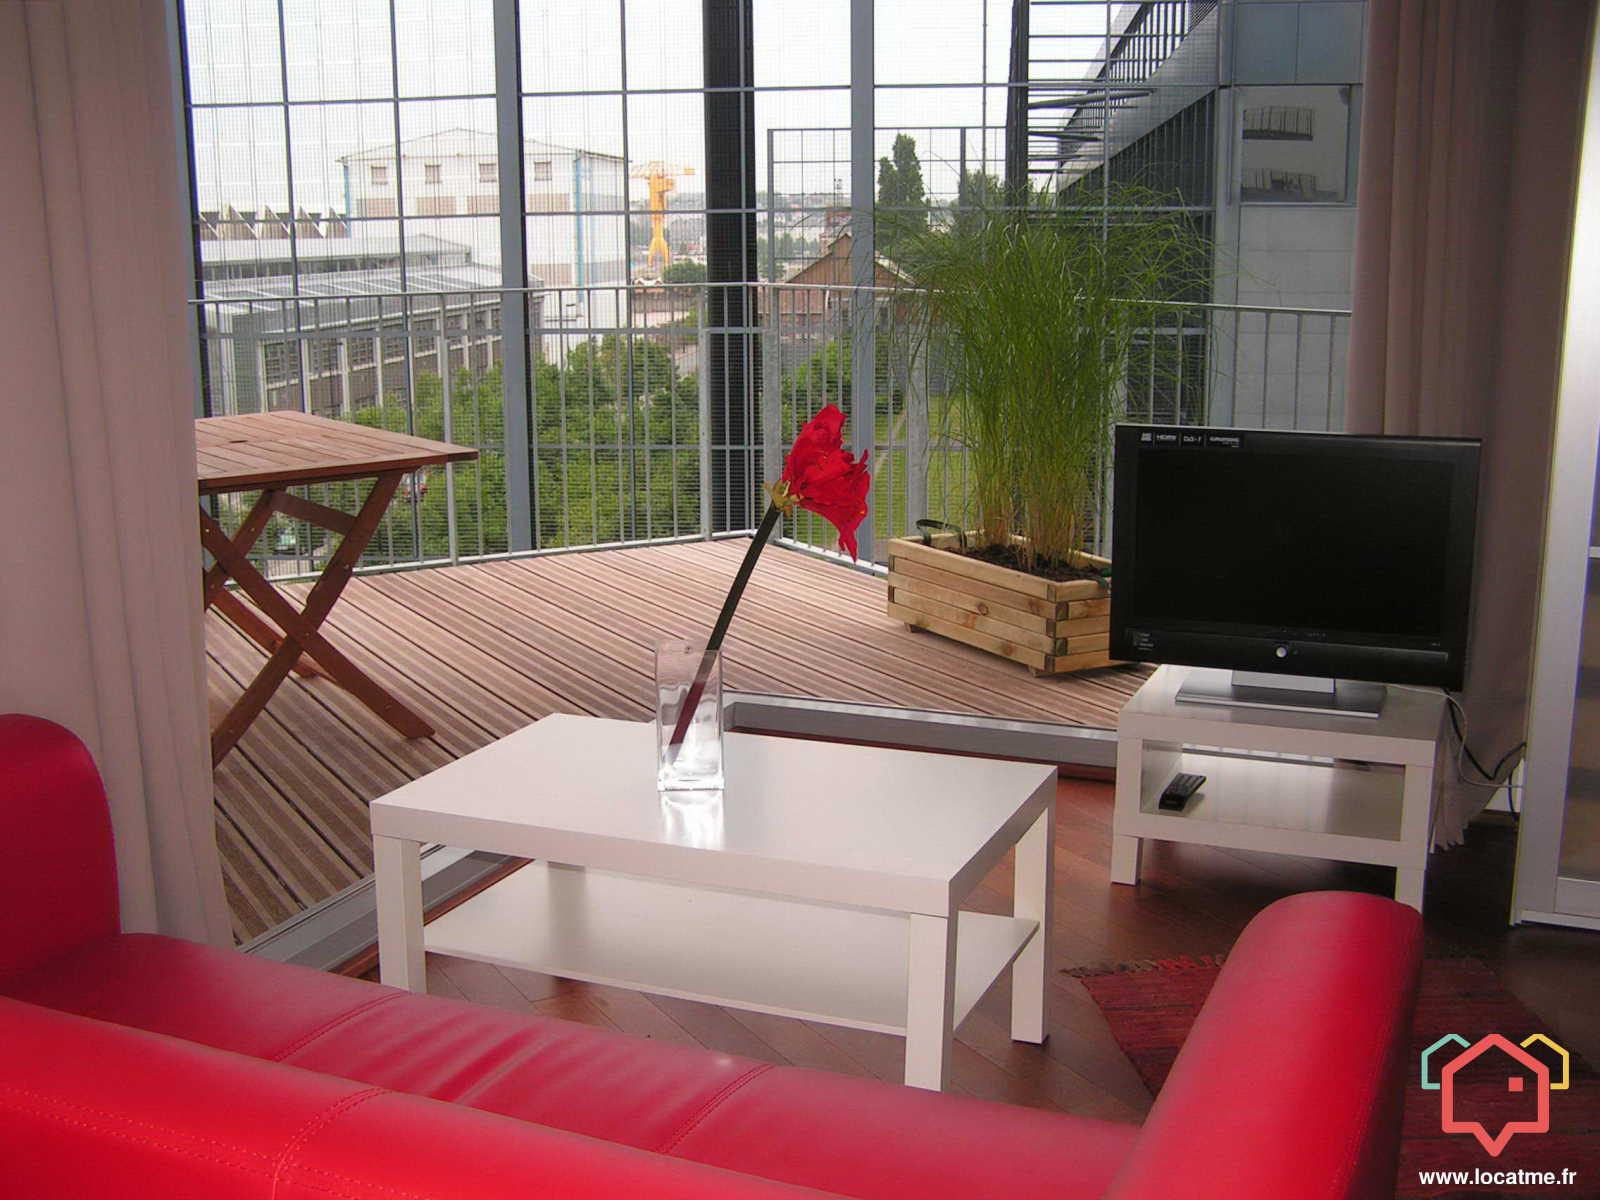 location appartement nantes les prix propos s nantes. Black Bedroom Furniture Sets. Home Design Ideas